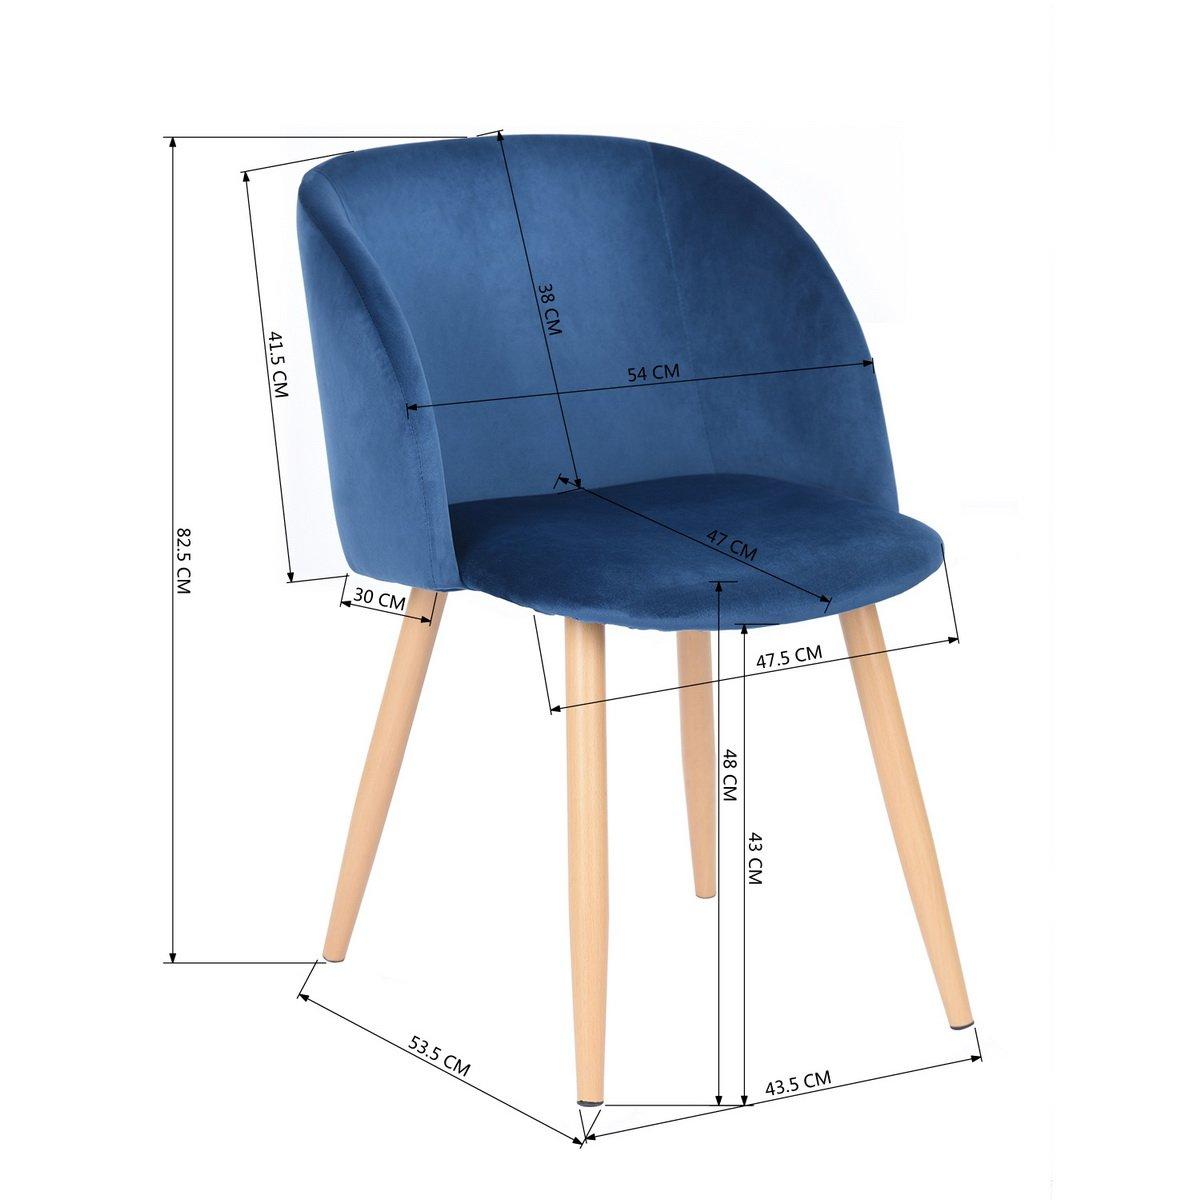 Gut 2 Retro Samt Akzent Sessel Küche Stuhl Esszimmer Stühle Bürostühle Sessel  Blau